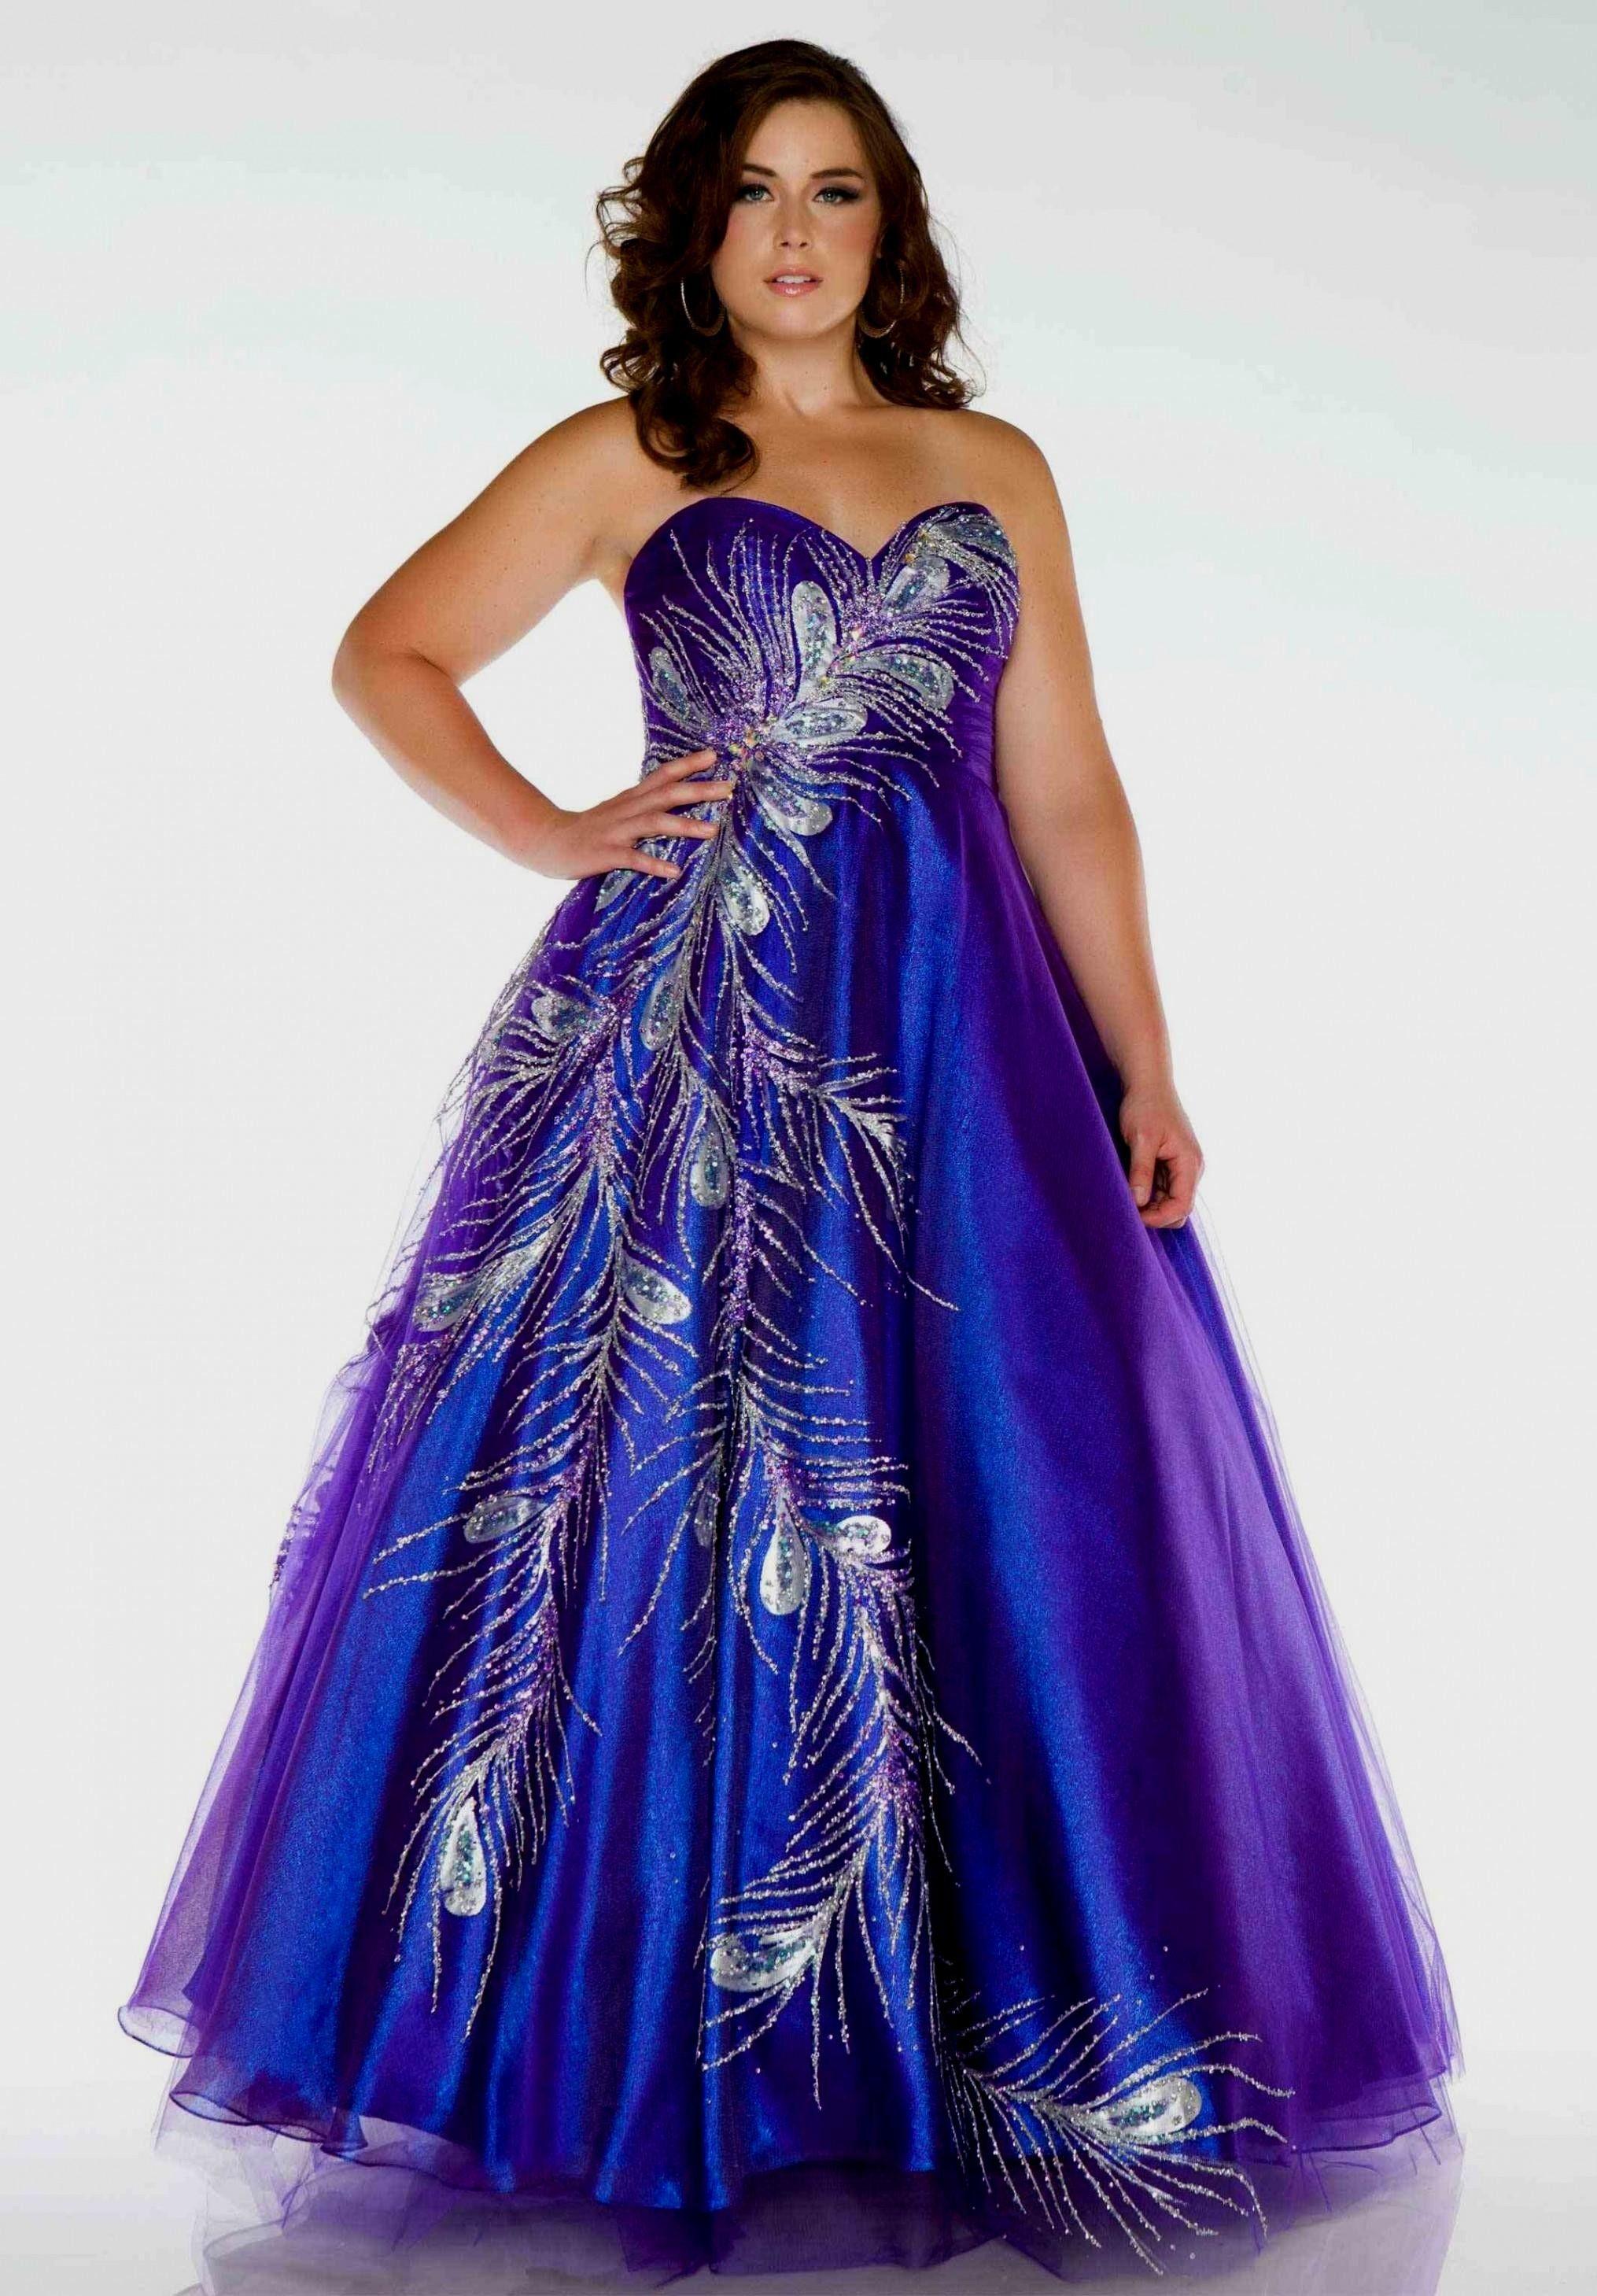 38+ Target plus size wedding dresses ideas in 2021